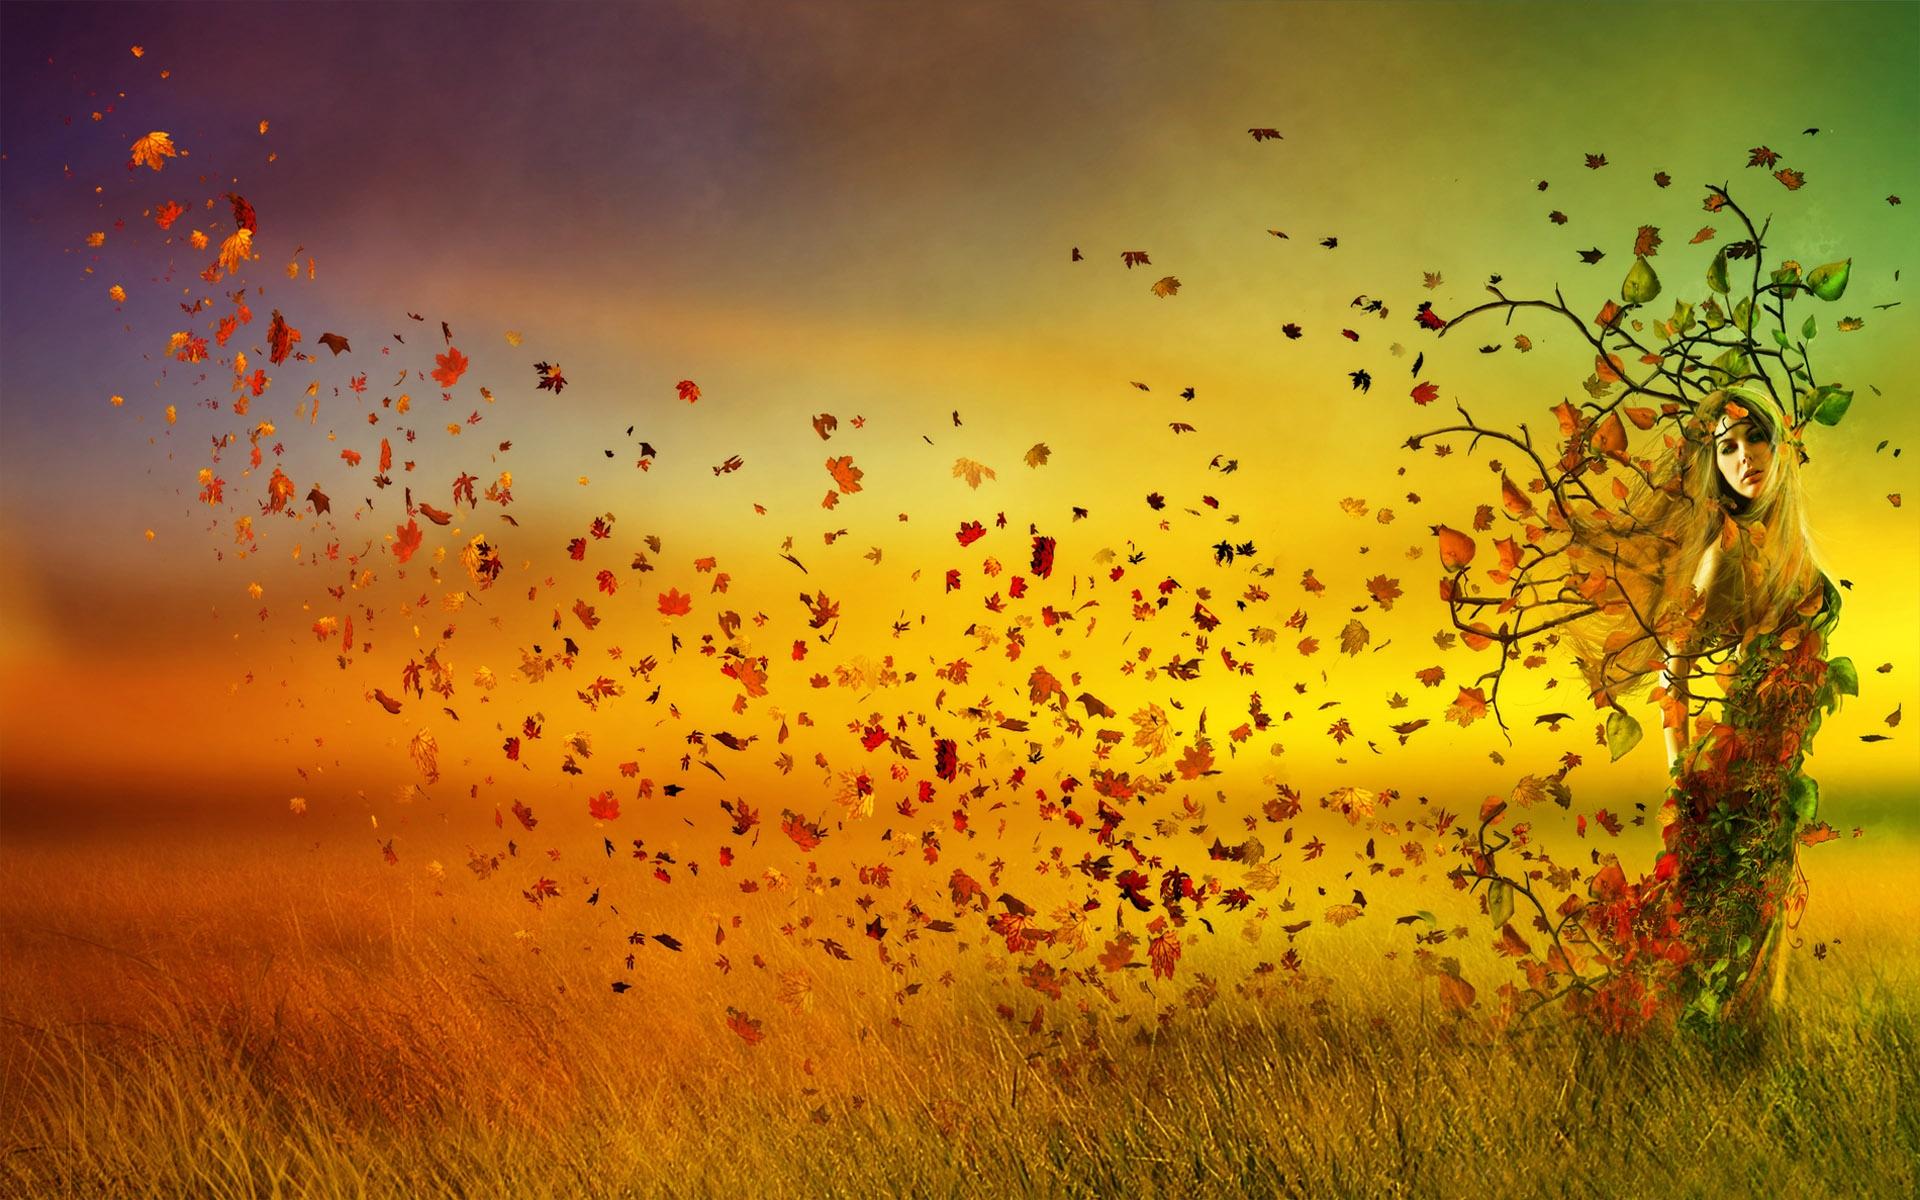 Autumn Beauty Girl Gold Leaves 2157 - Nature HD Desktop Wallpaper